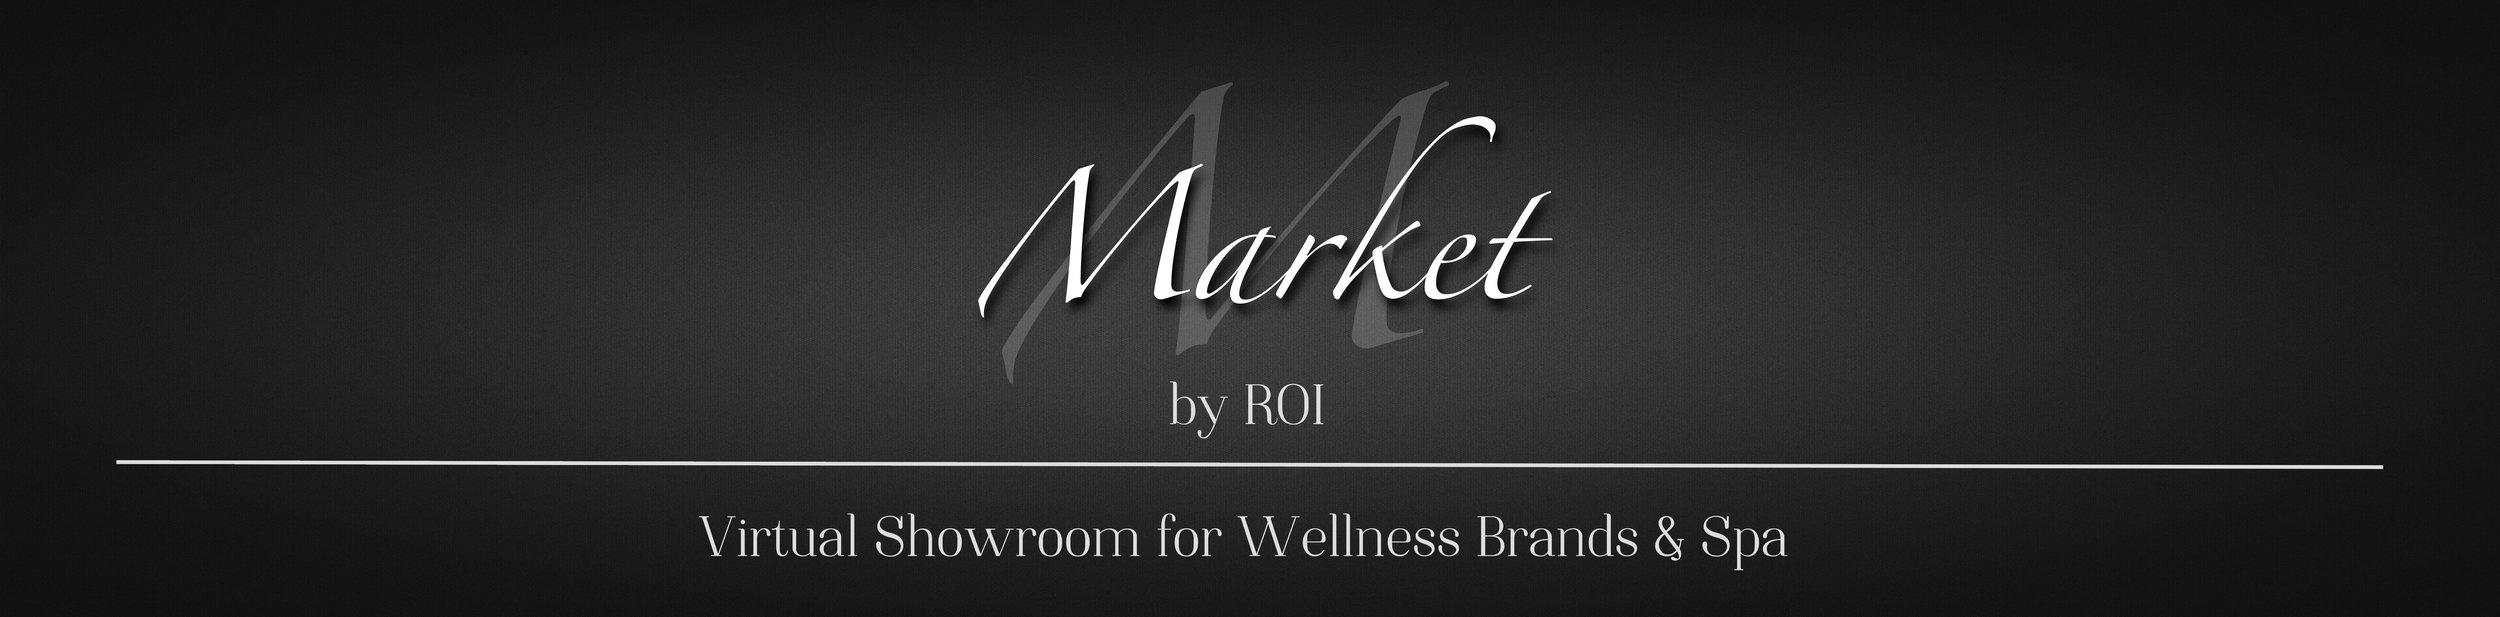 Market by ROI.jpg